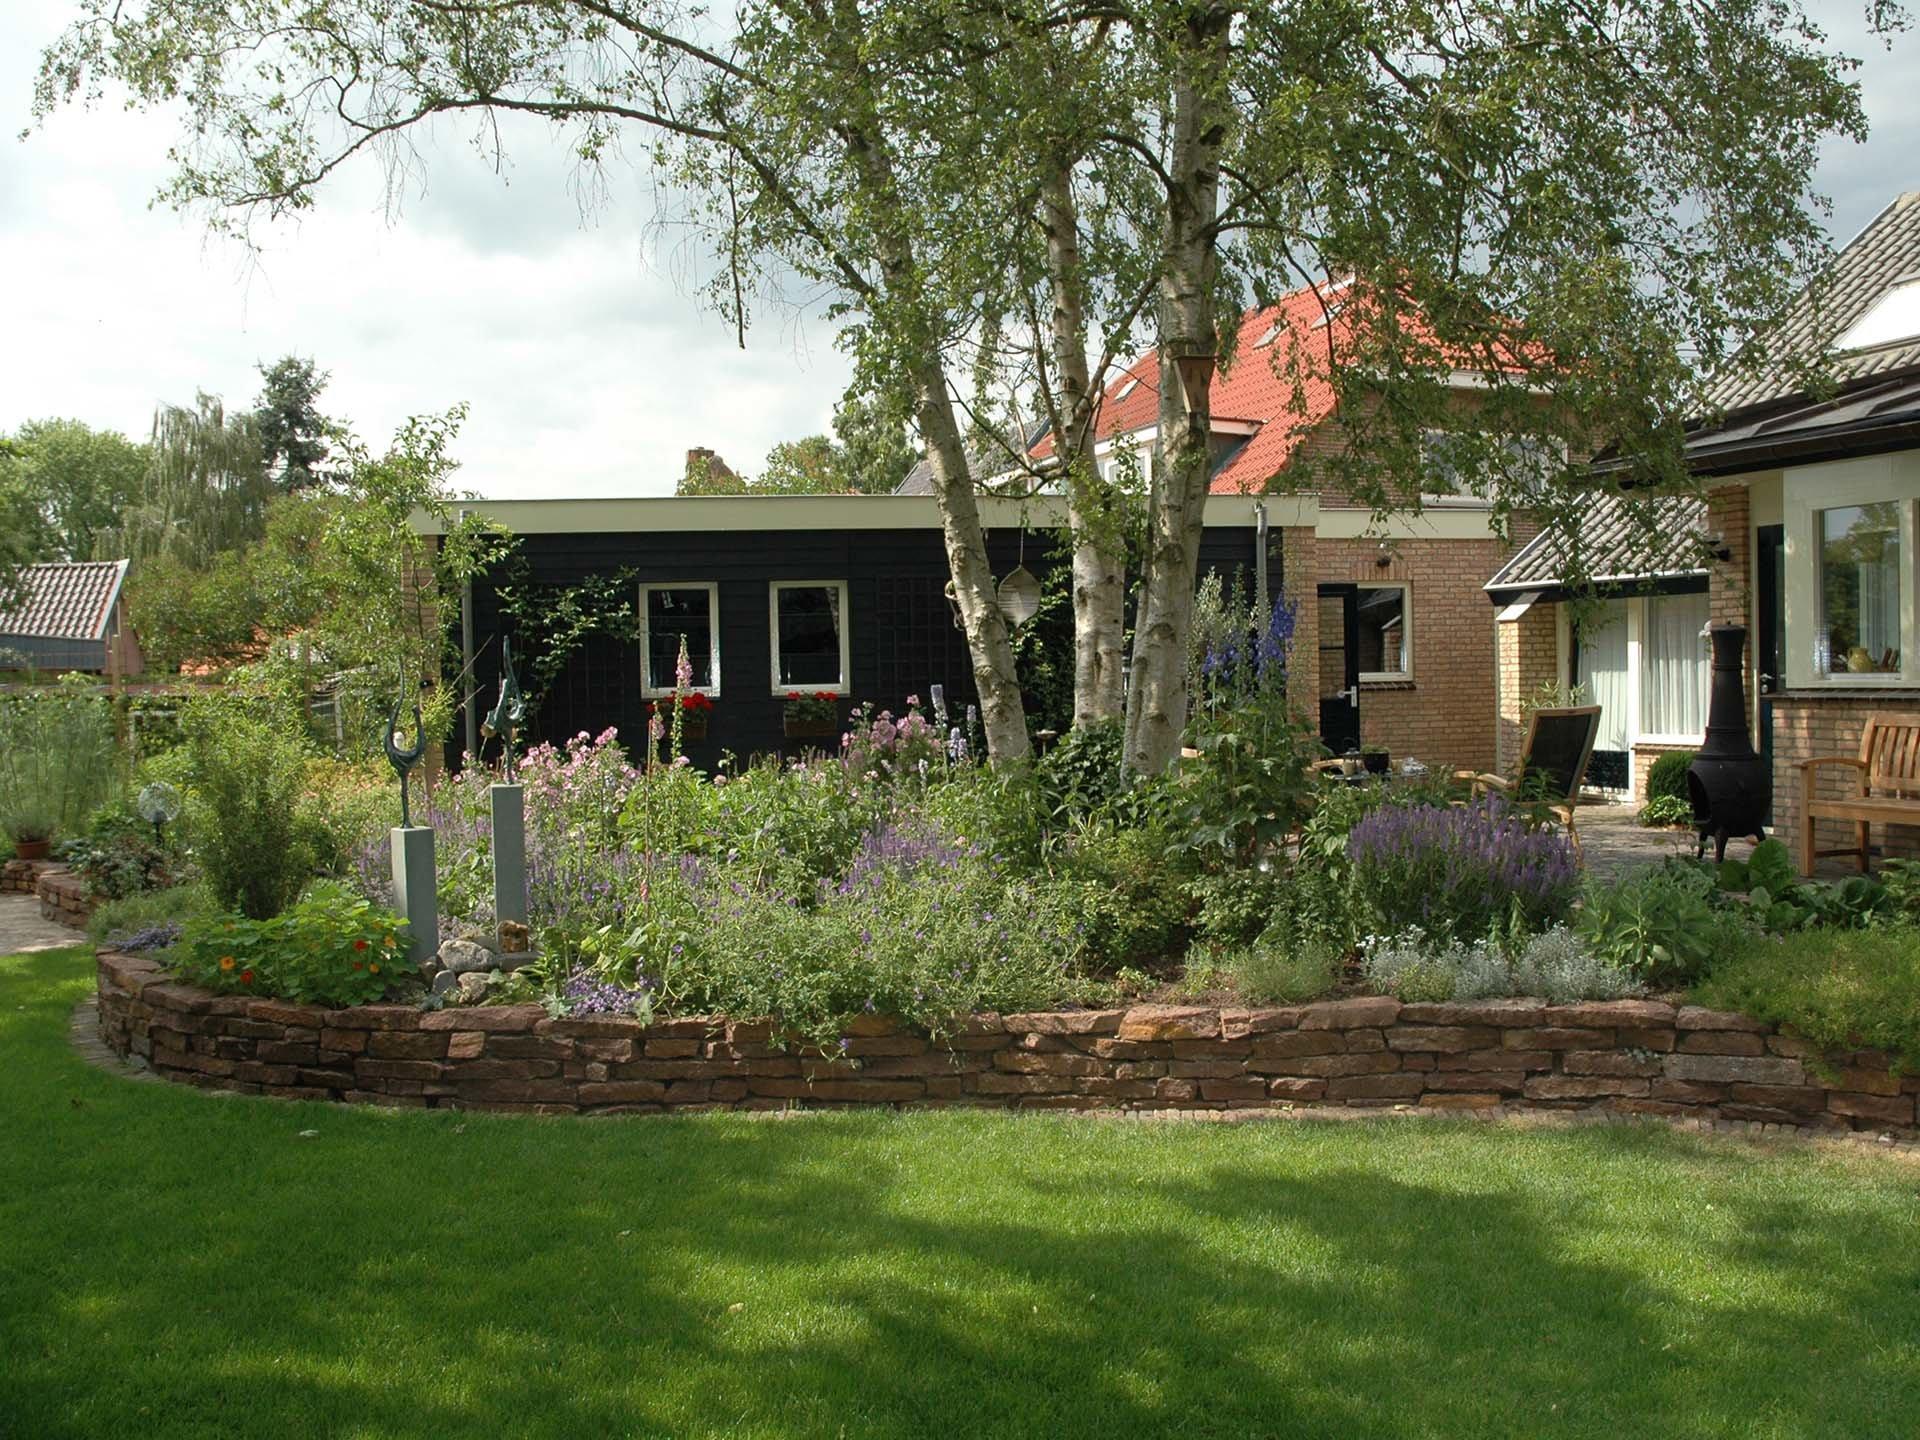 01 Tuin te Zwolle 2